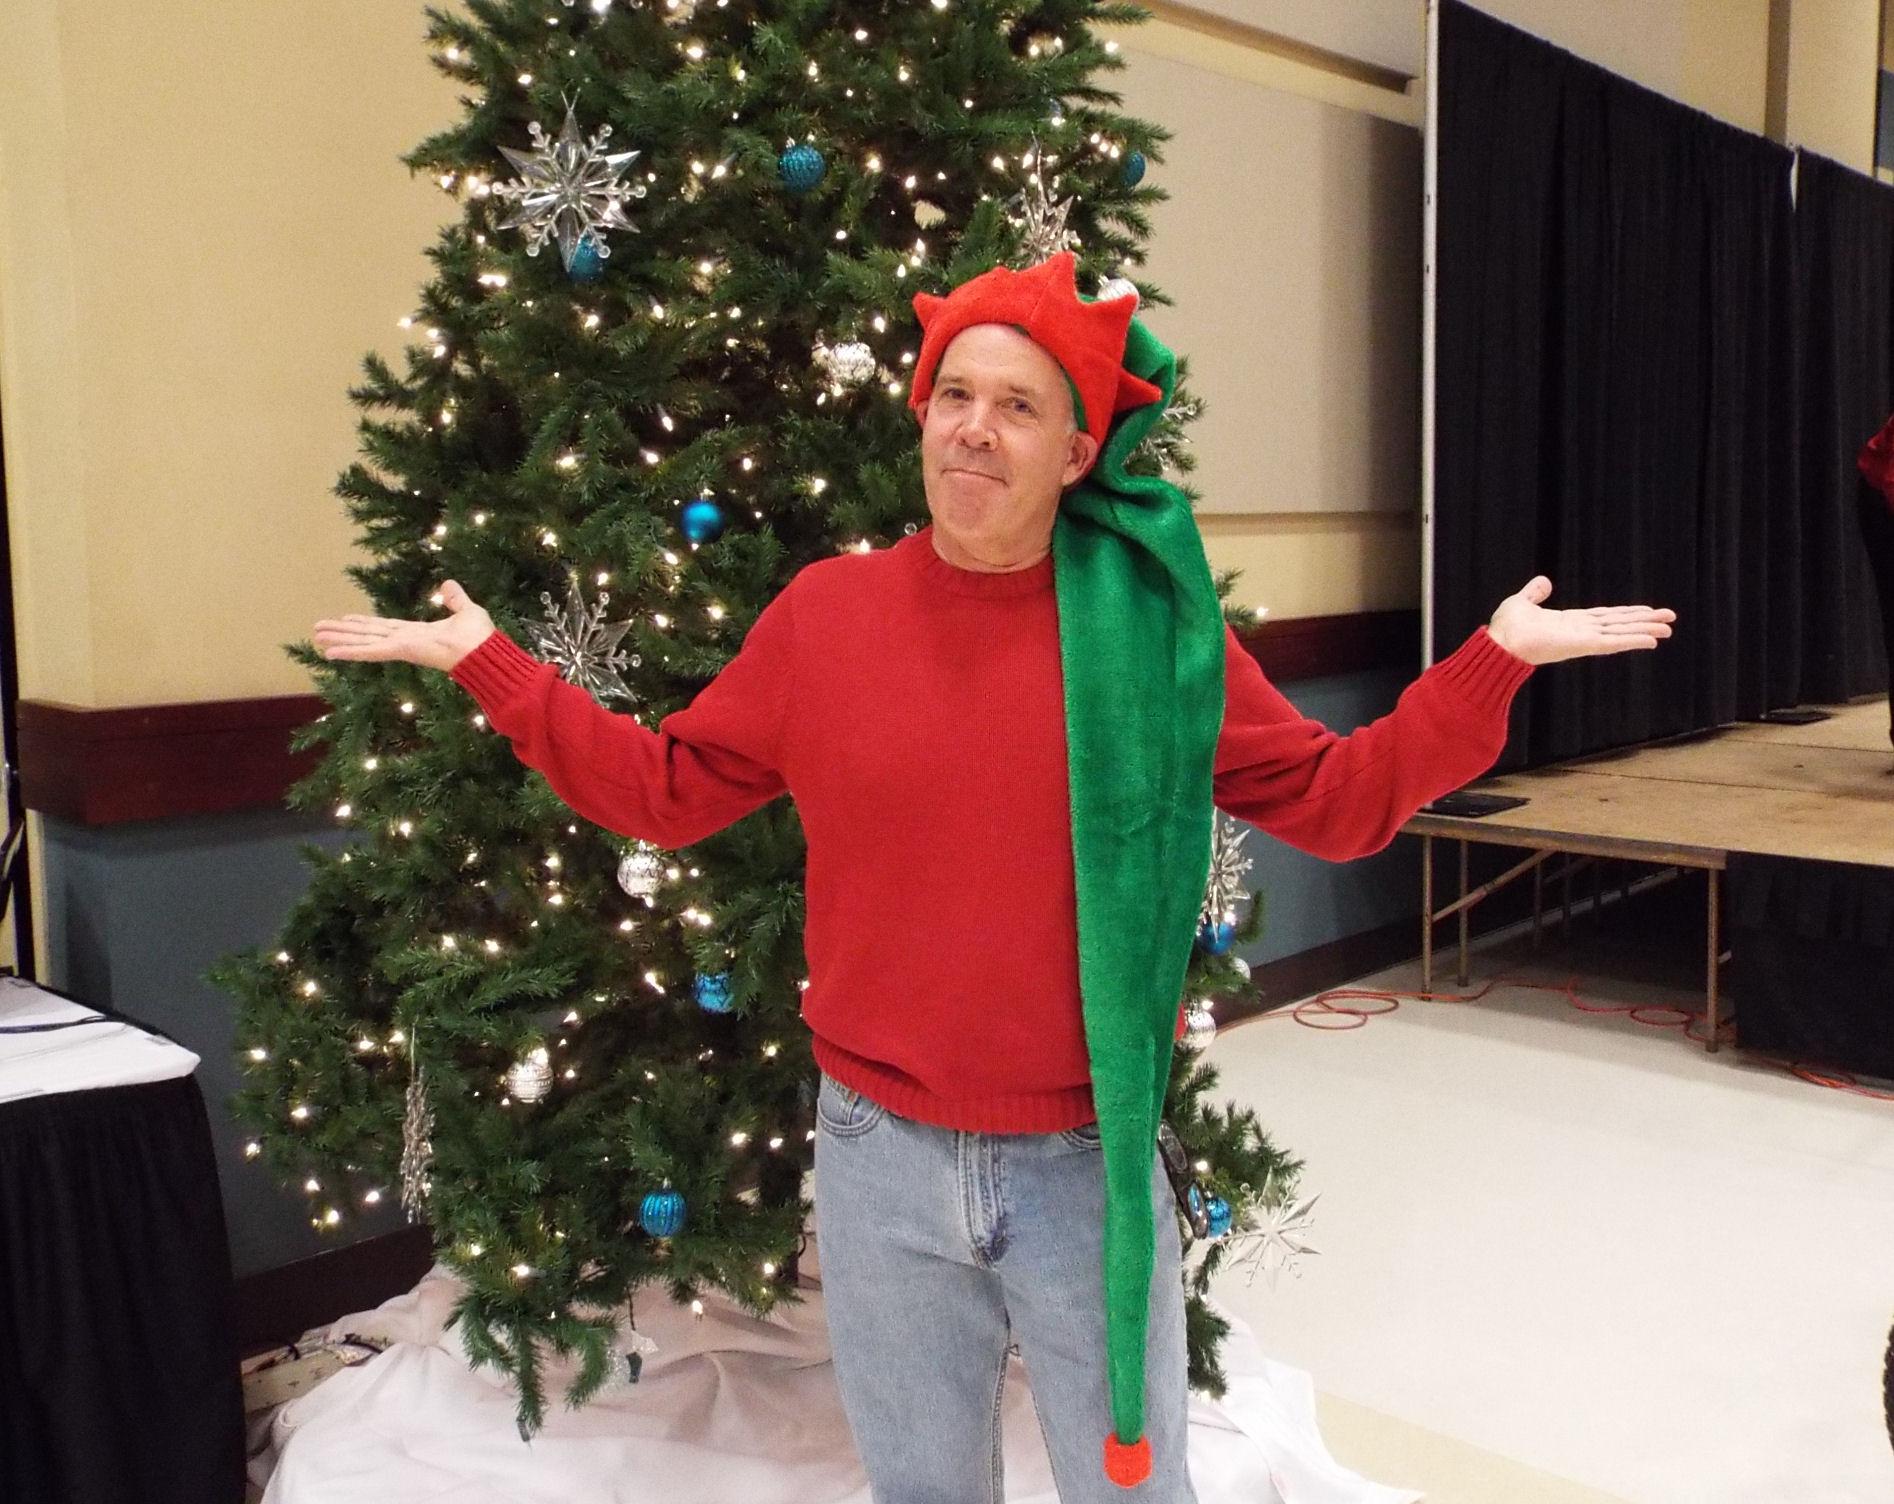 Jugglers, Dancers, Twirlers, and Santa